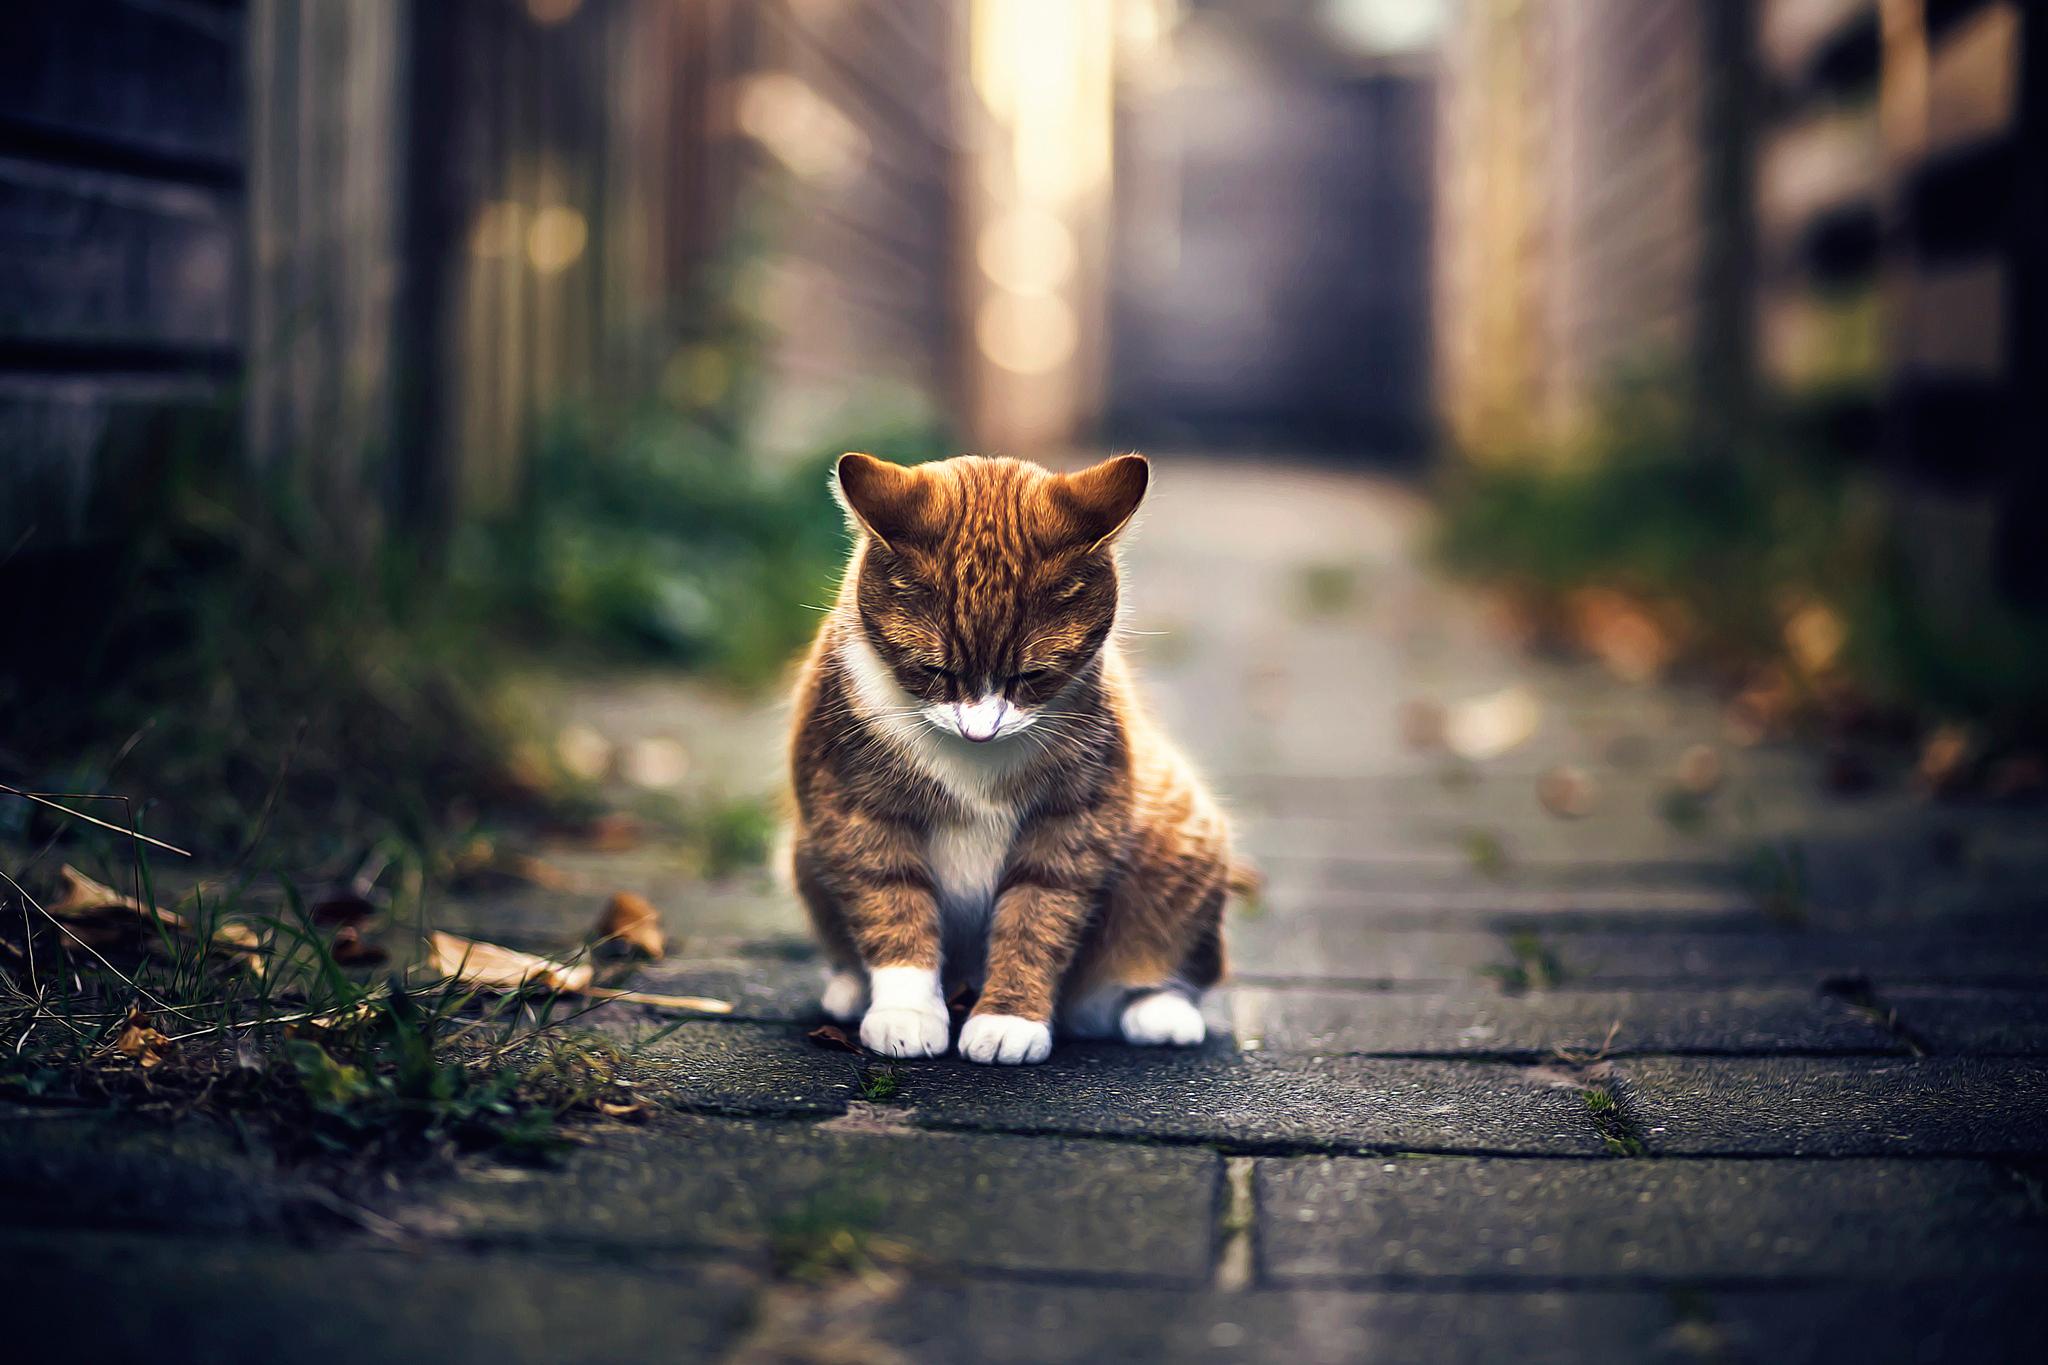 картинка грустного котенка веспуччи совершил